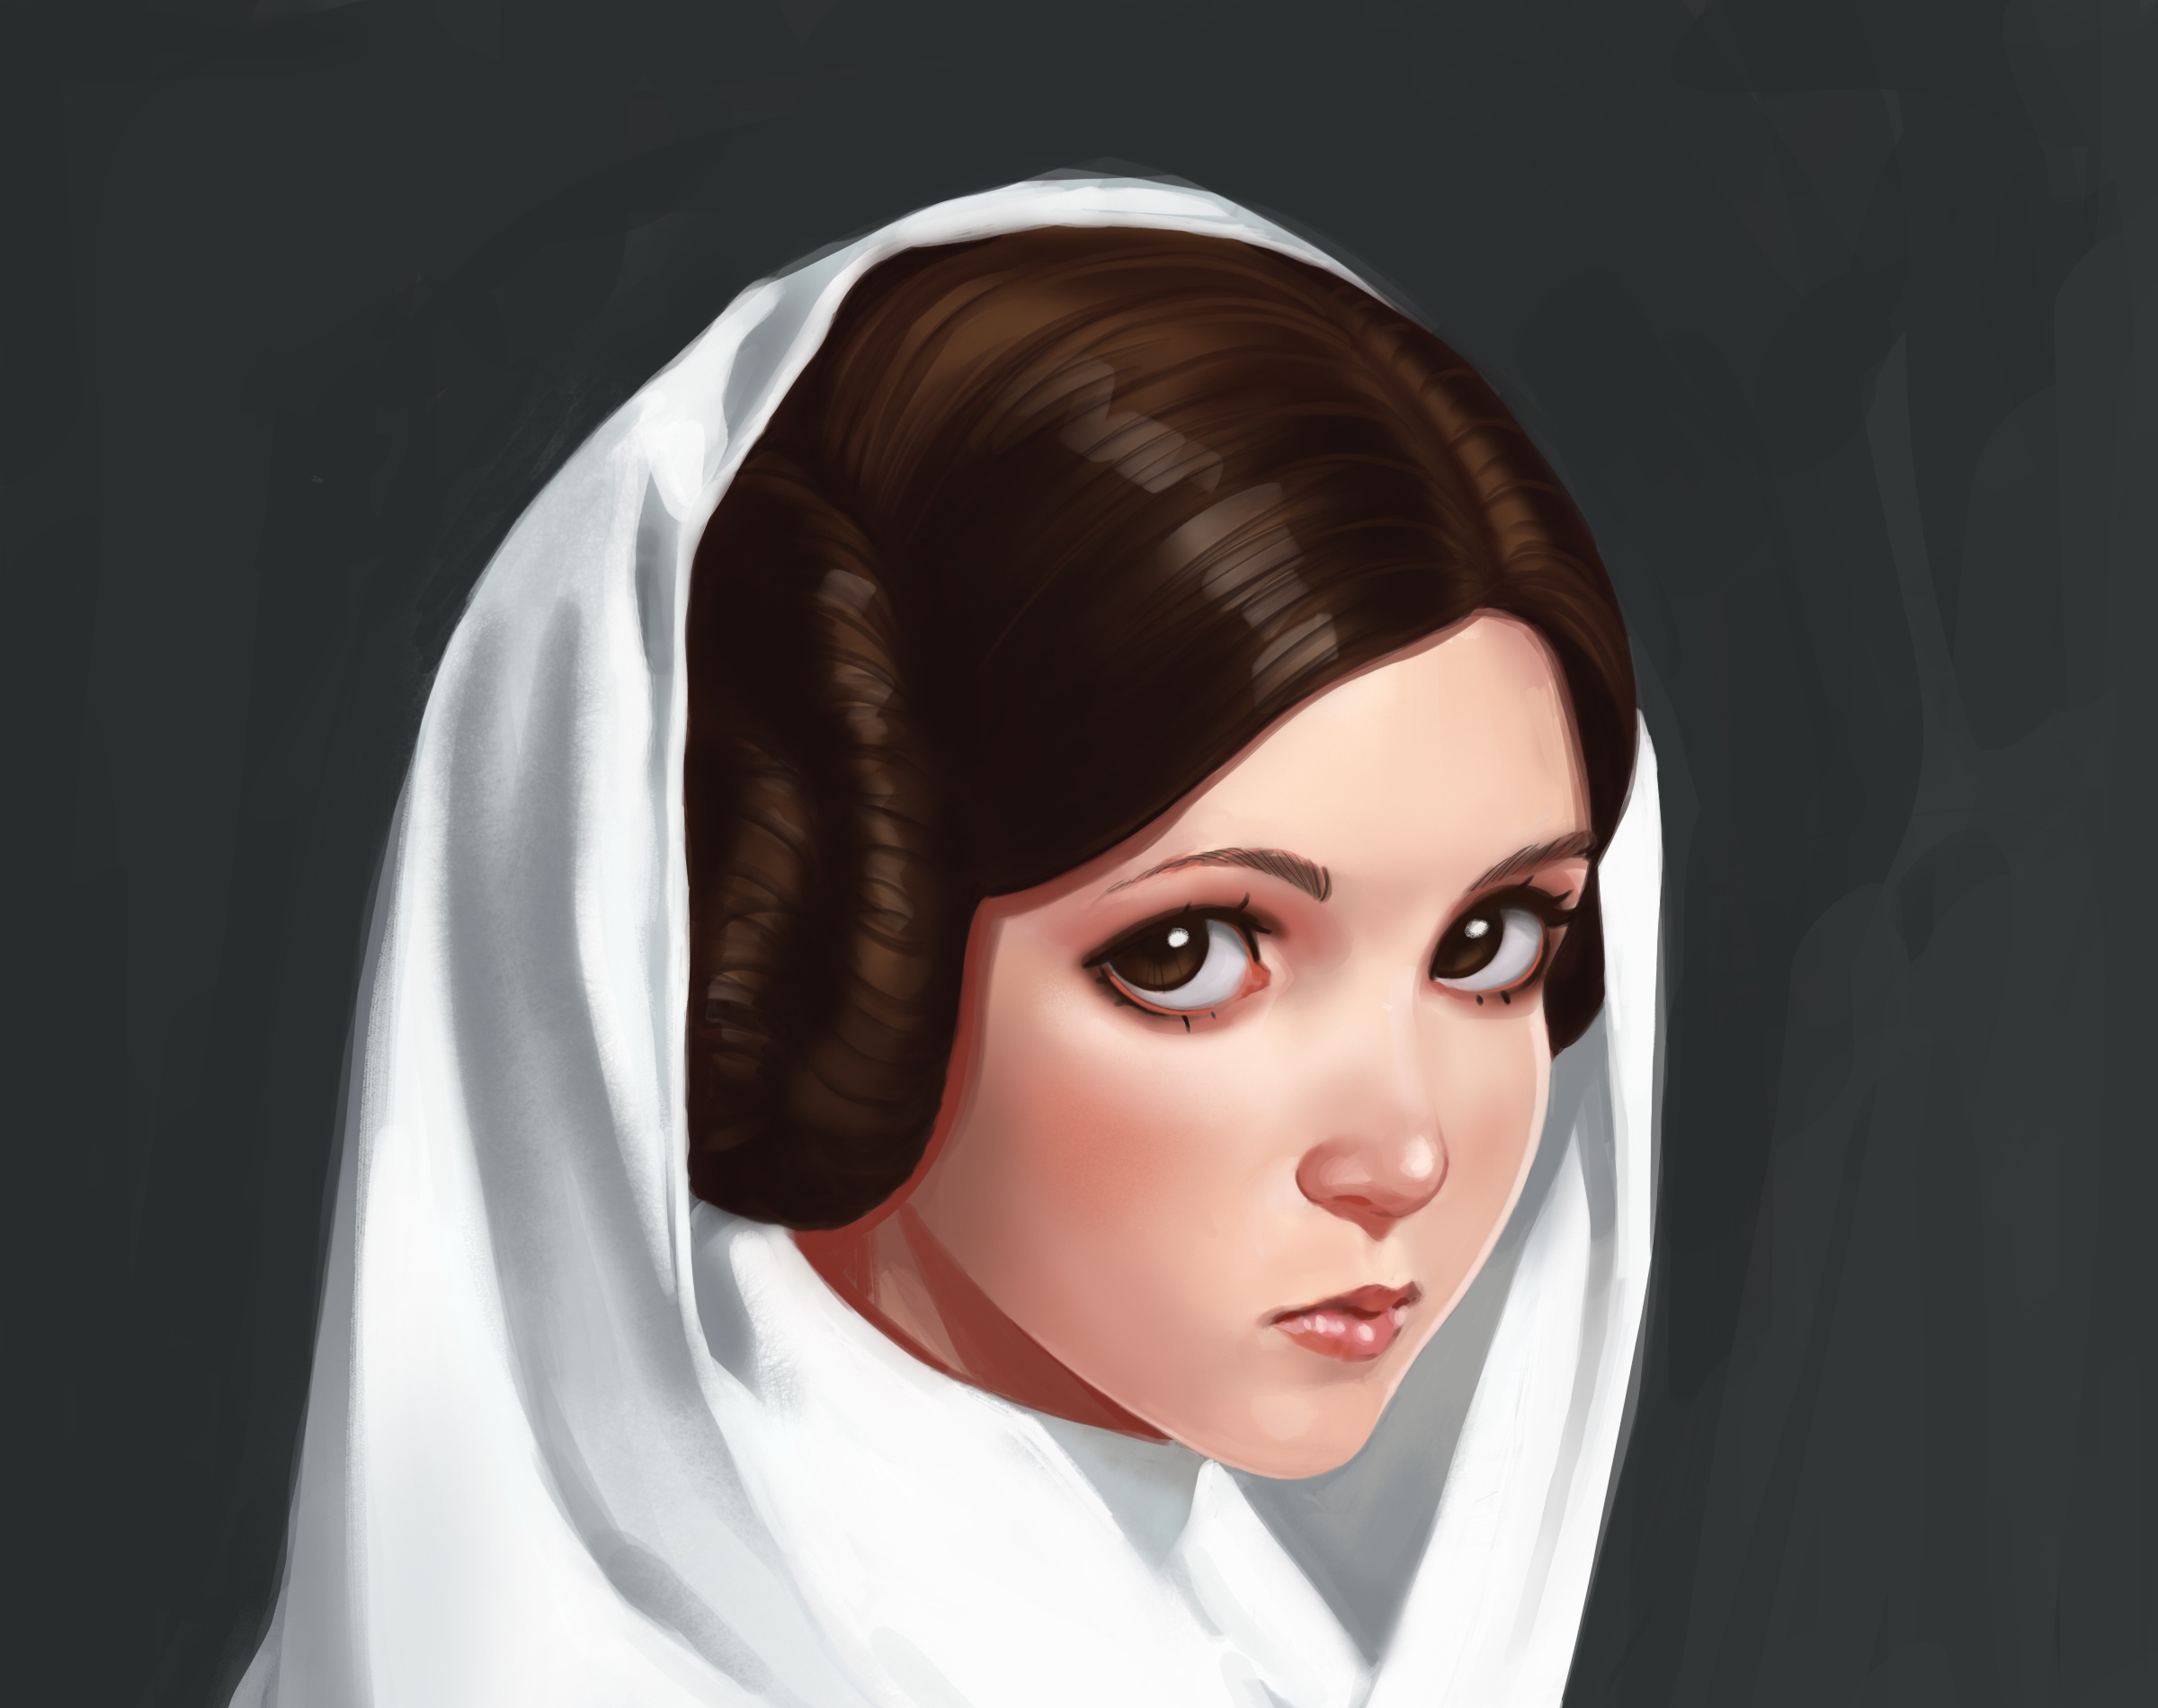 Desktop Wallpapers Star Wars Movies Fanart By Ivantalavera Leia